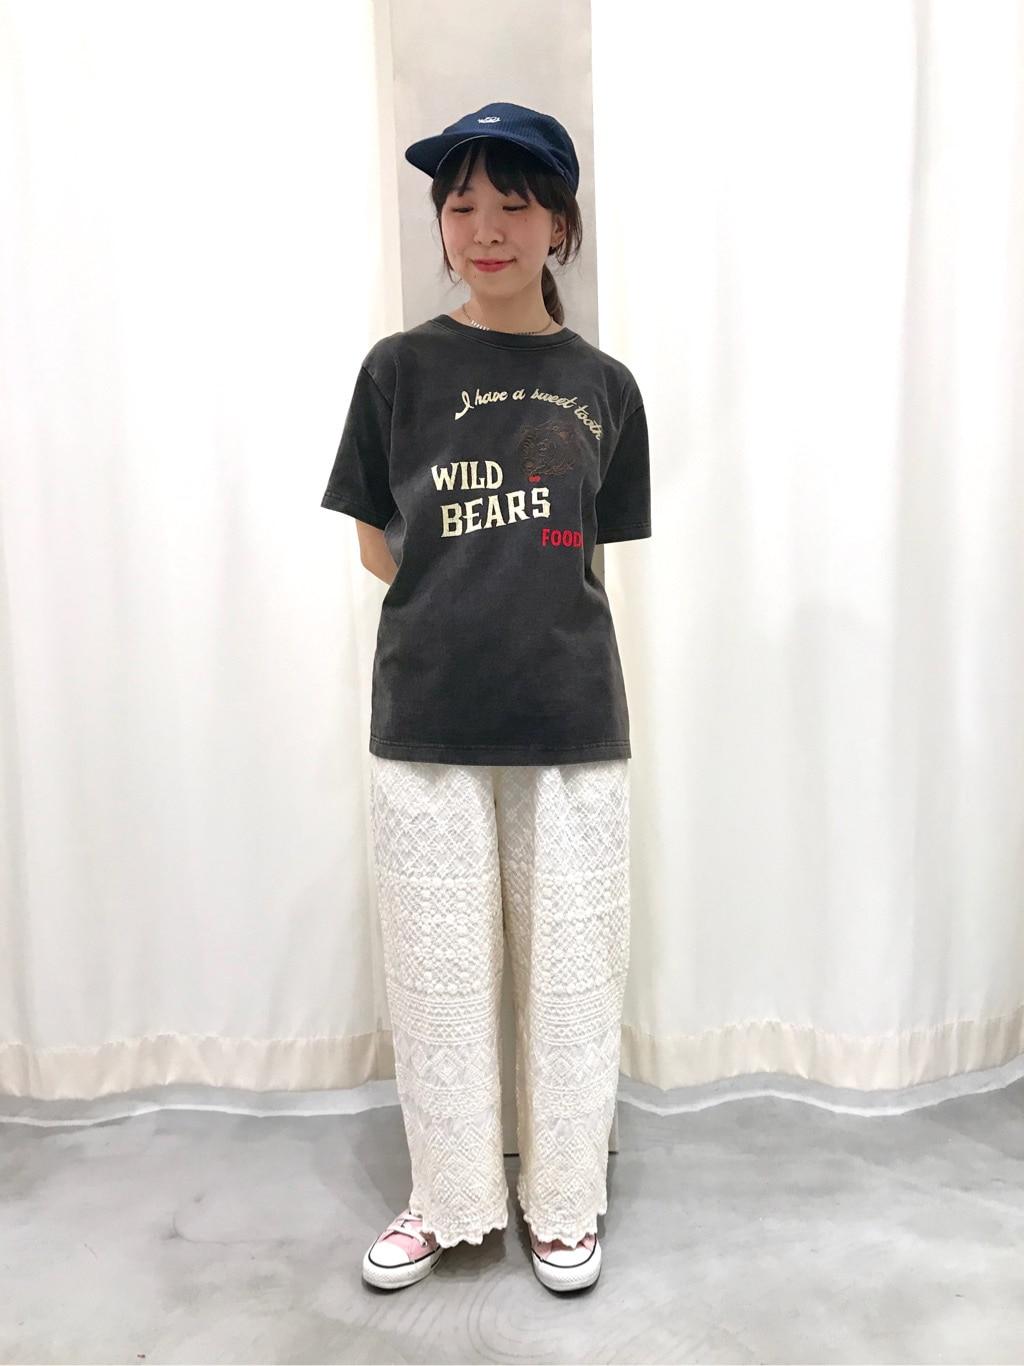 AMB SHOP PAR ICI CHILD WOMAN , PAR ICI 東京スカイツリータウン・ソラマチ 身長:154cm 2020.06.30